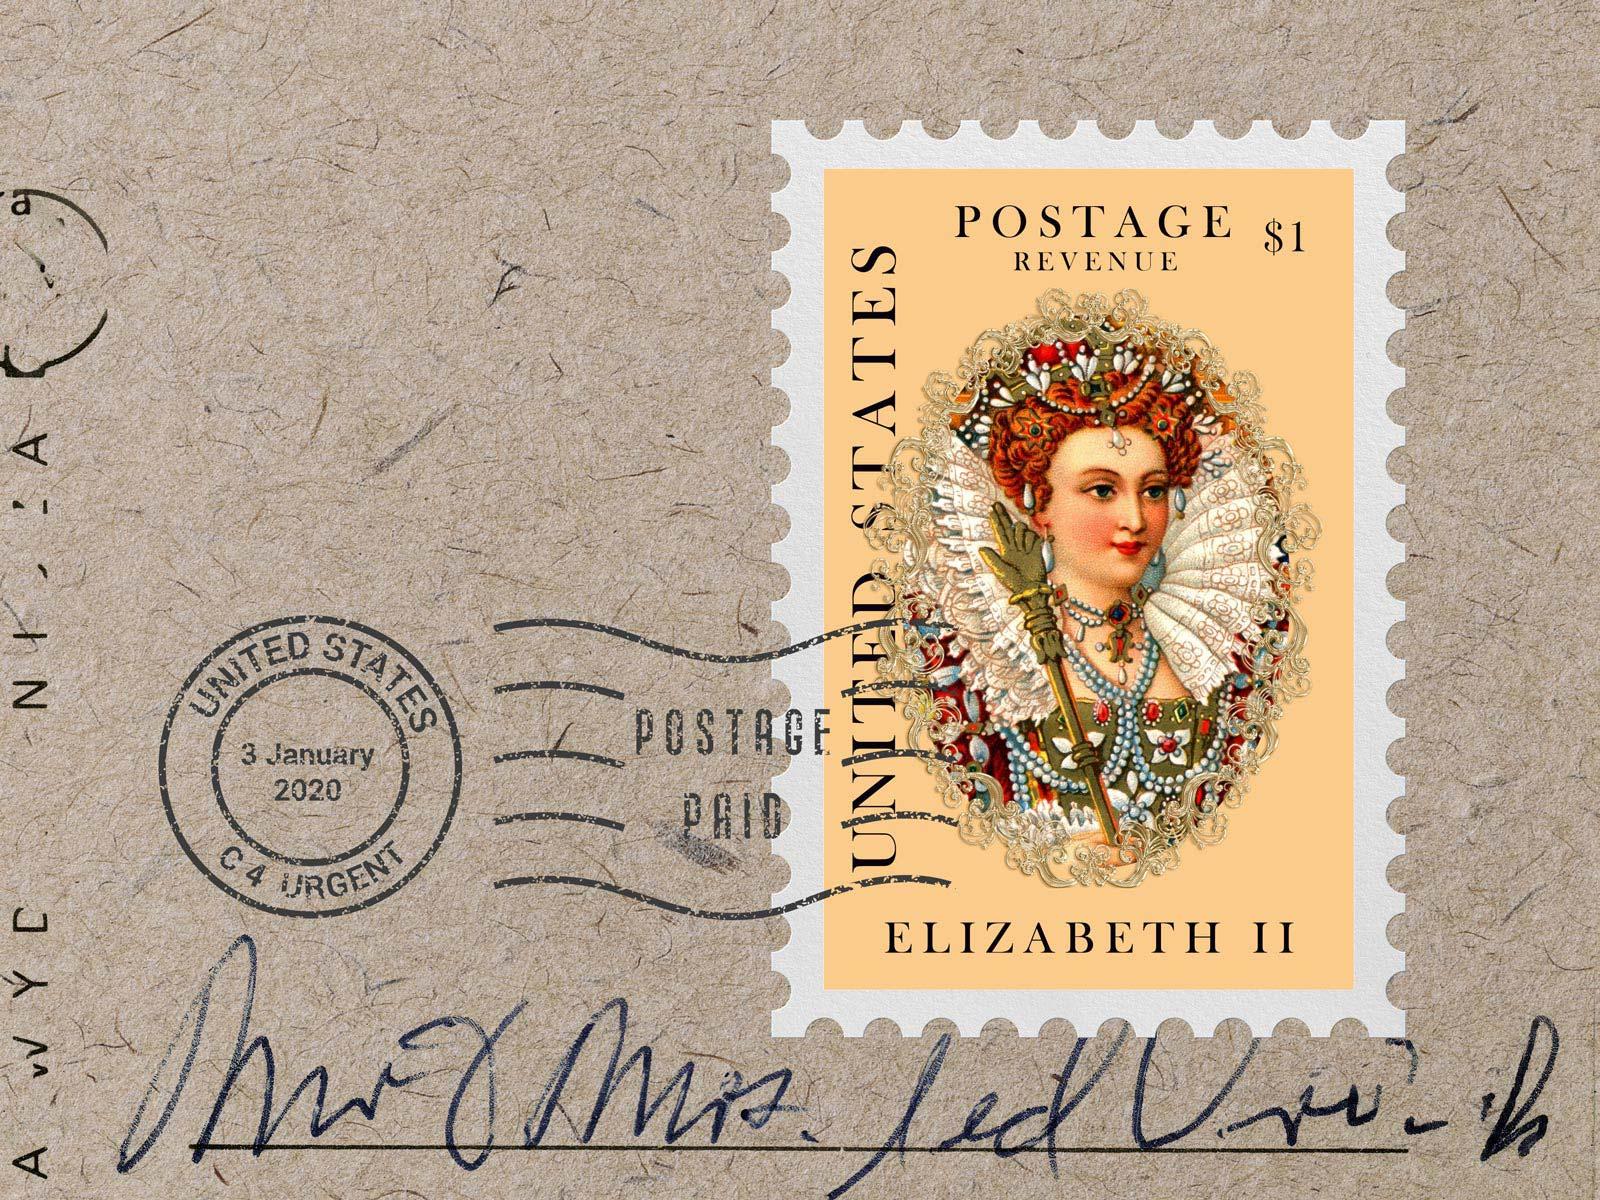 Free-Postage-Stamp-Mockup-PSD-Portrait